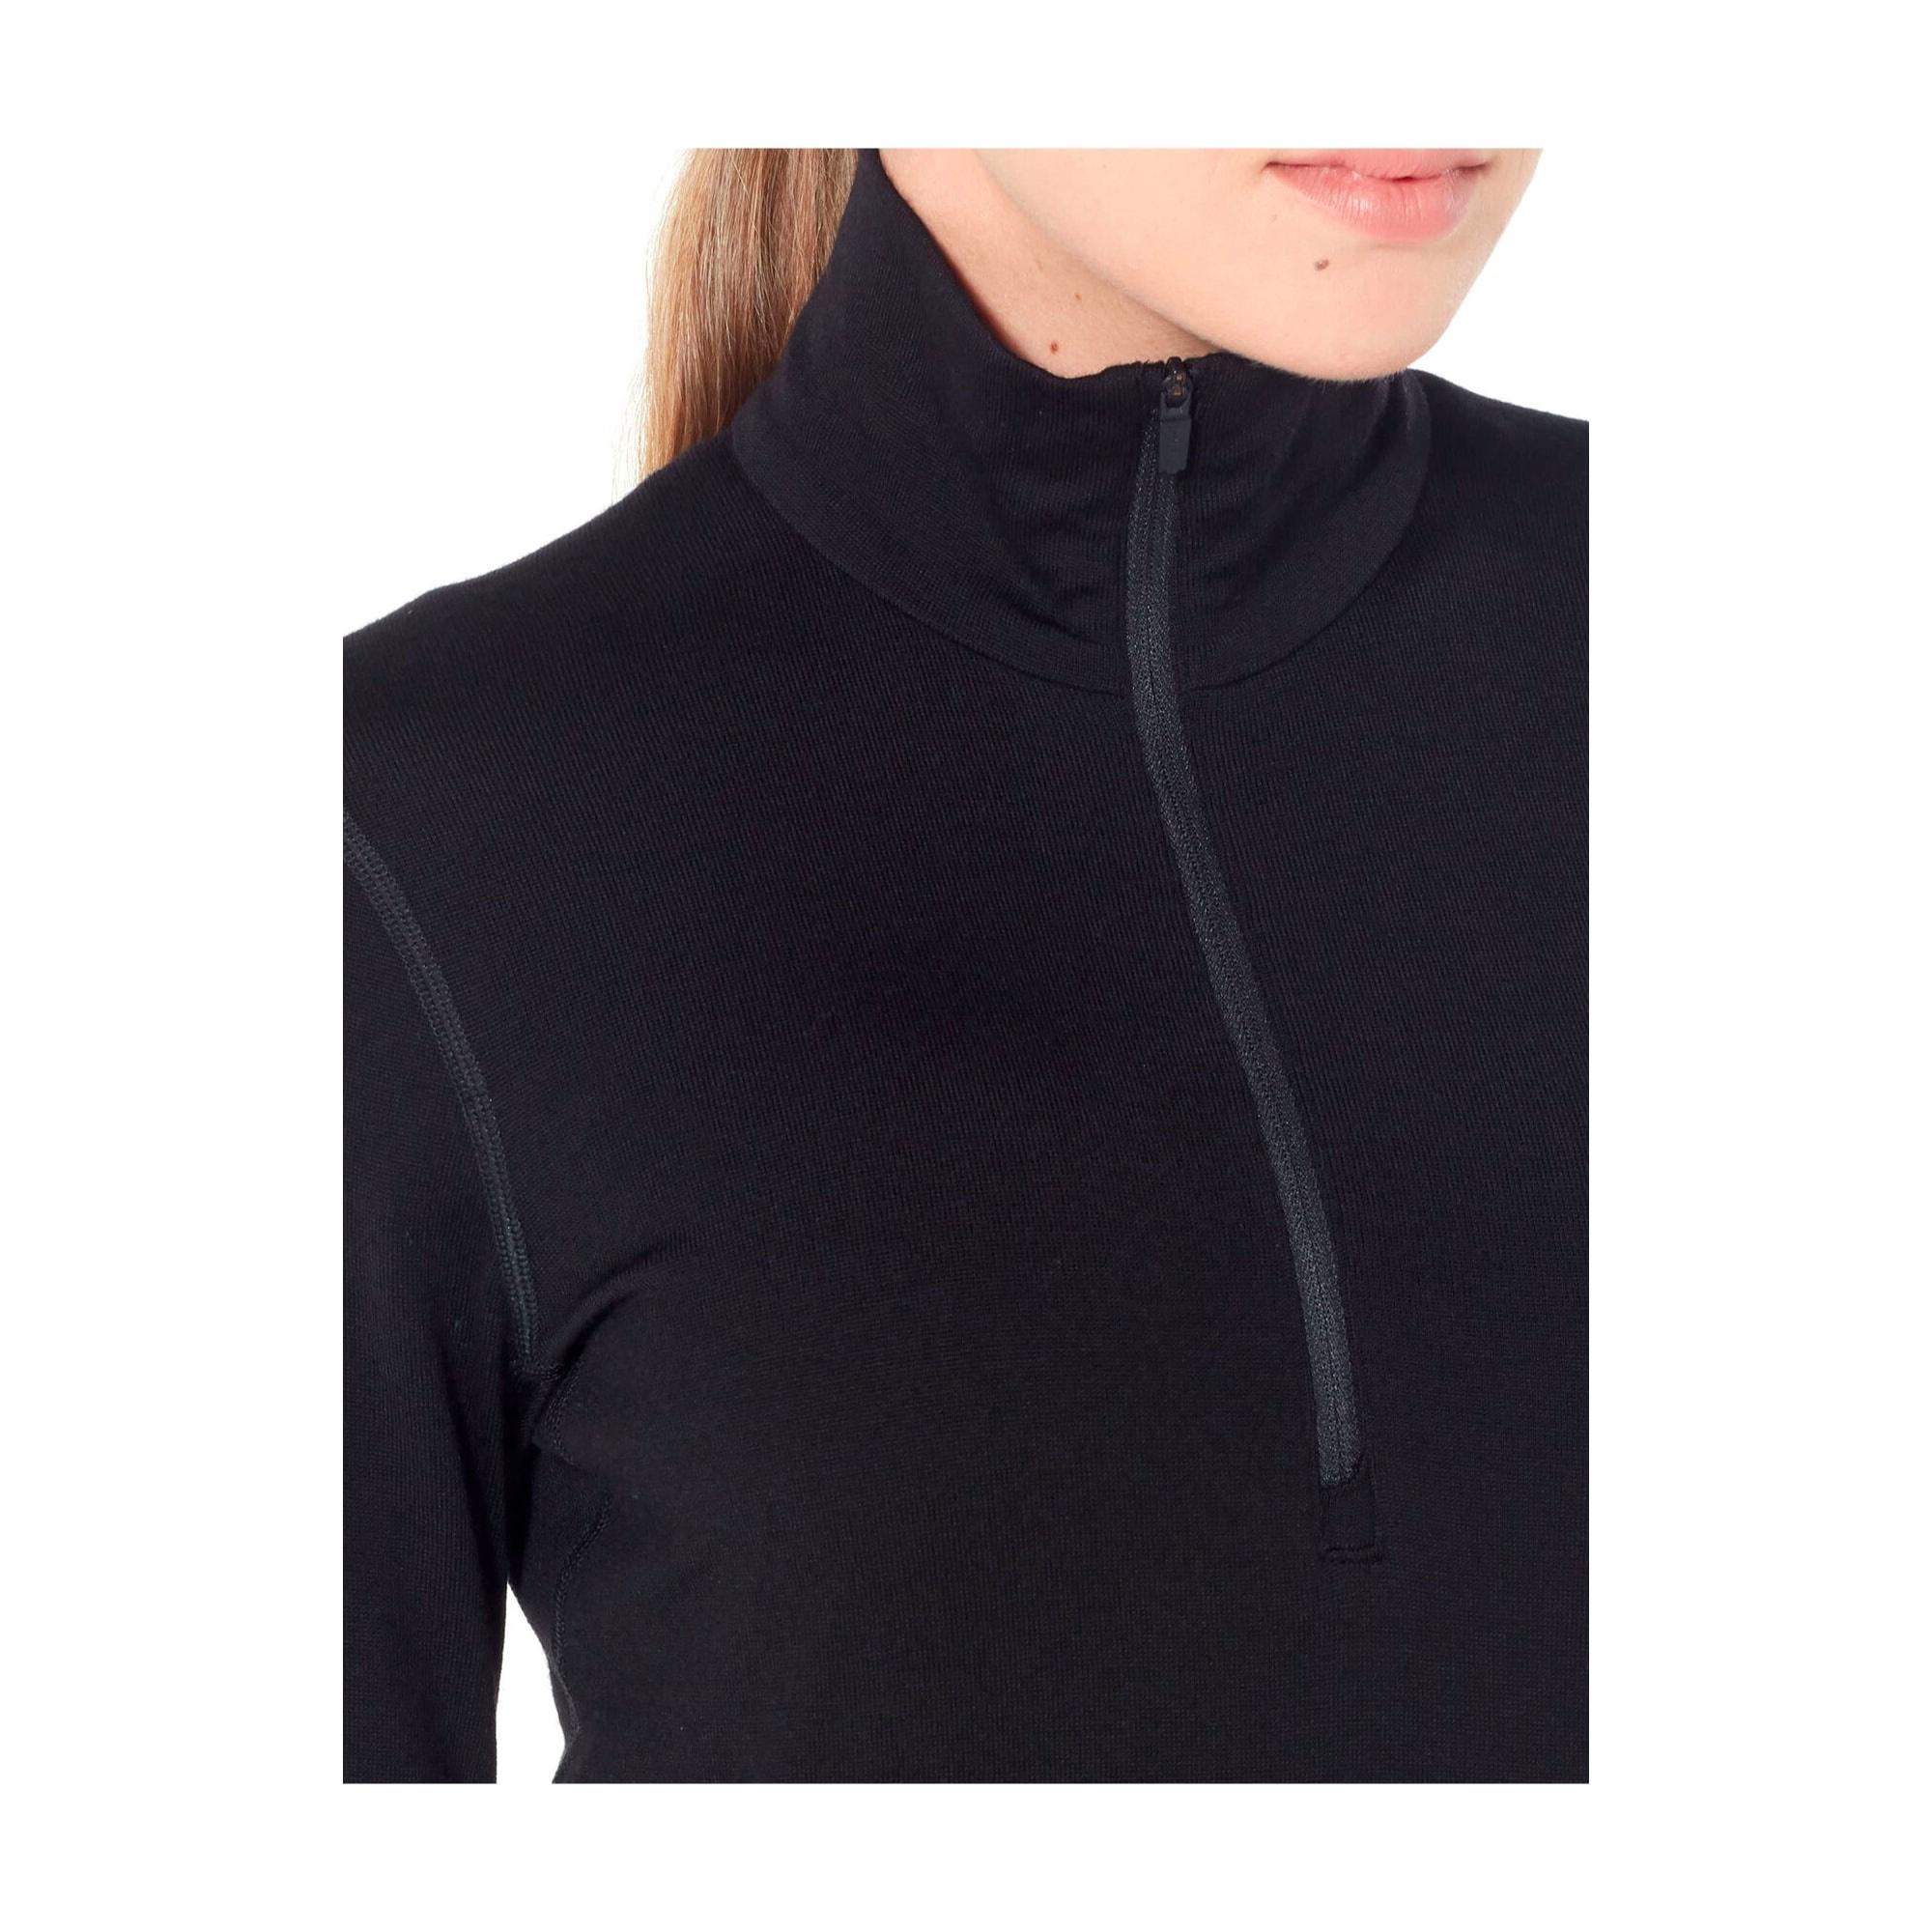 Women's 260 Tech Long Sleeve Half Zip-5